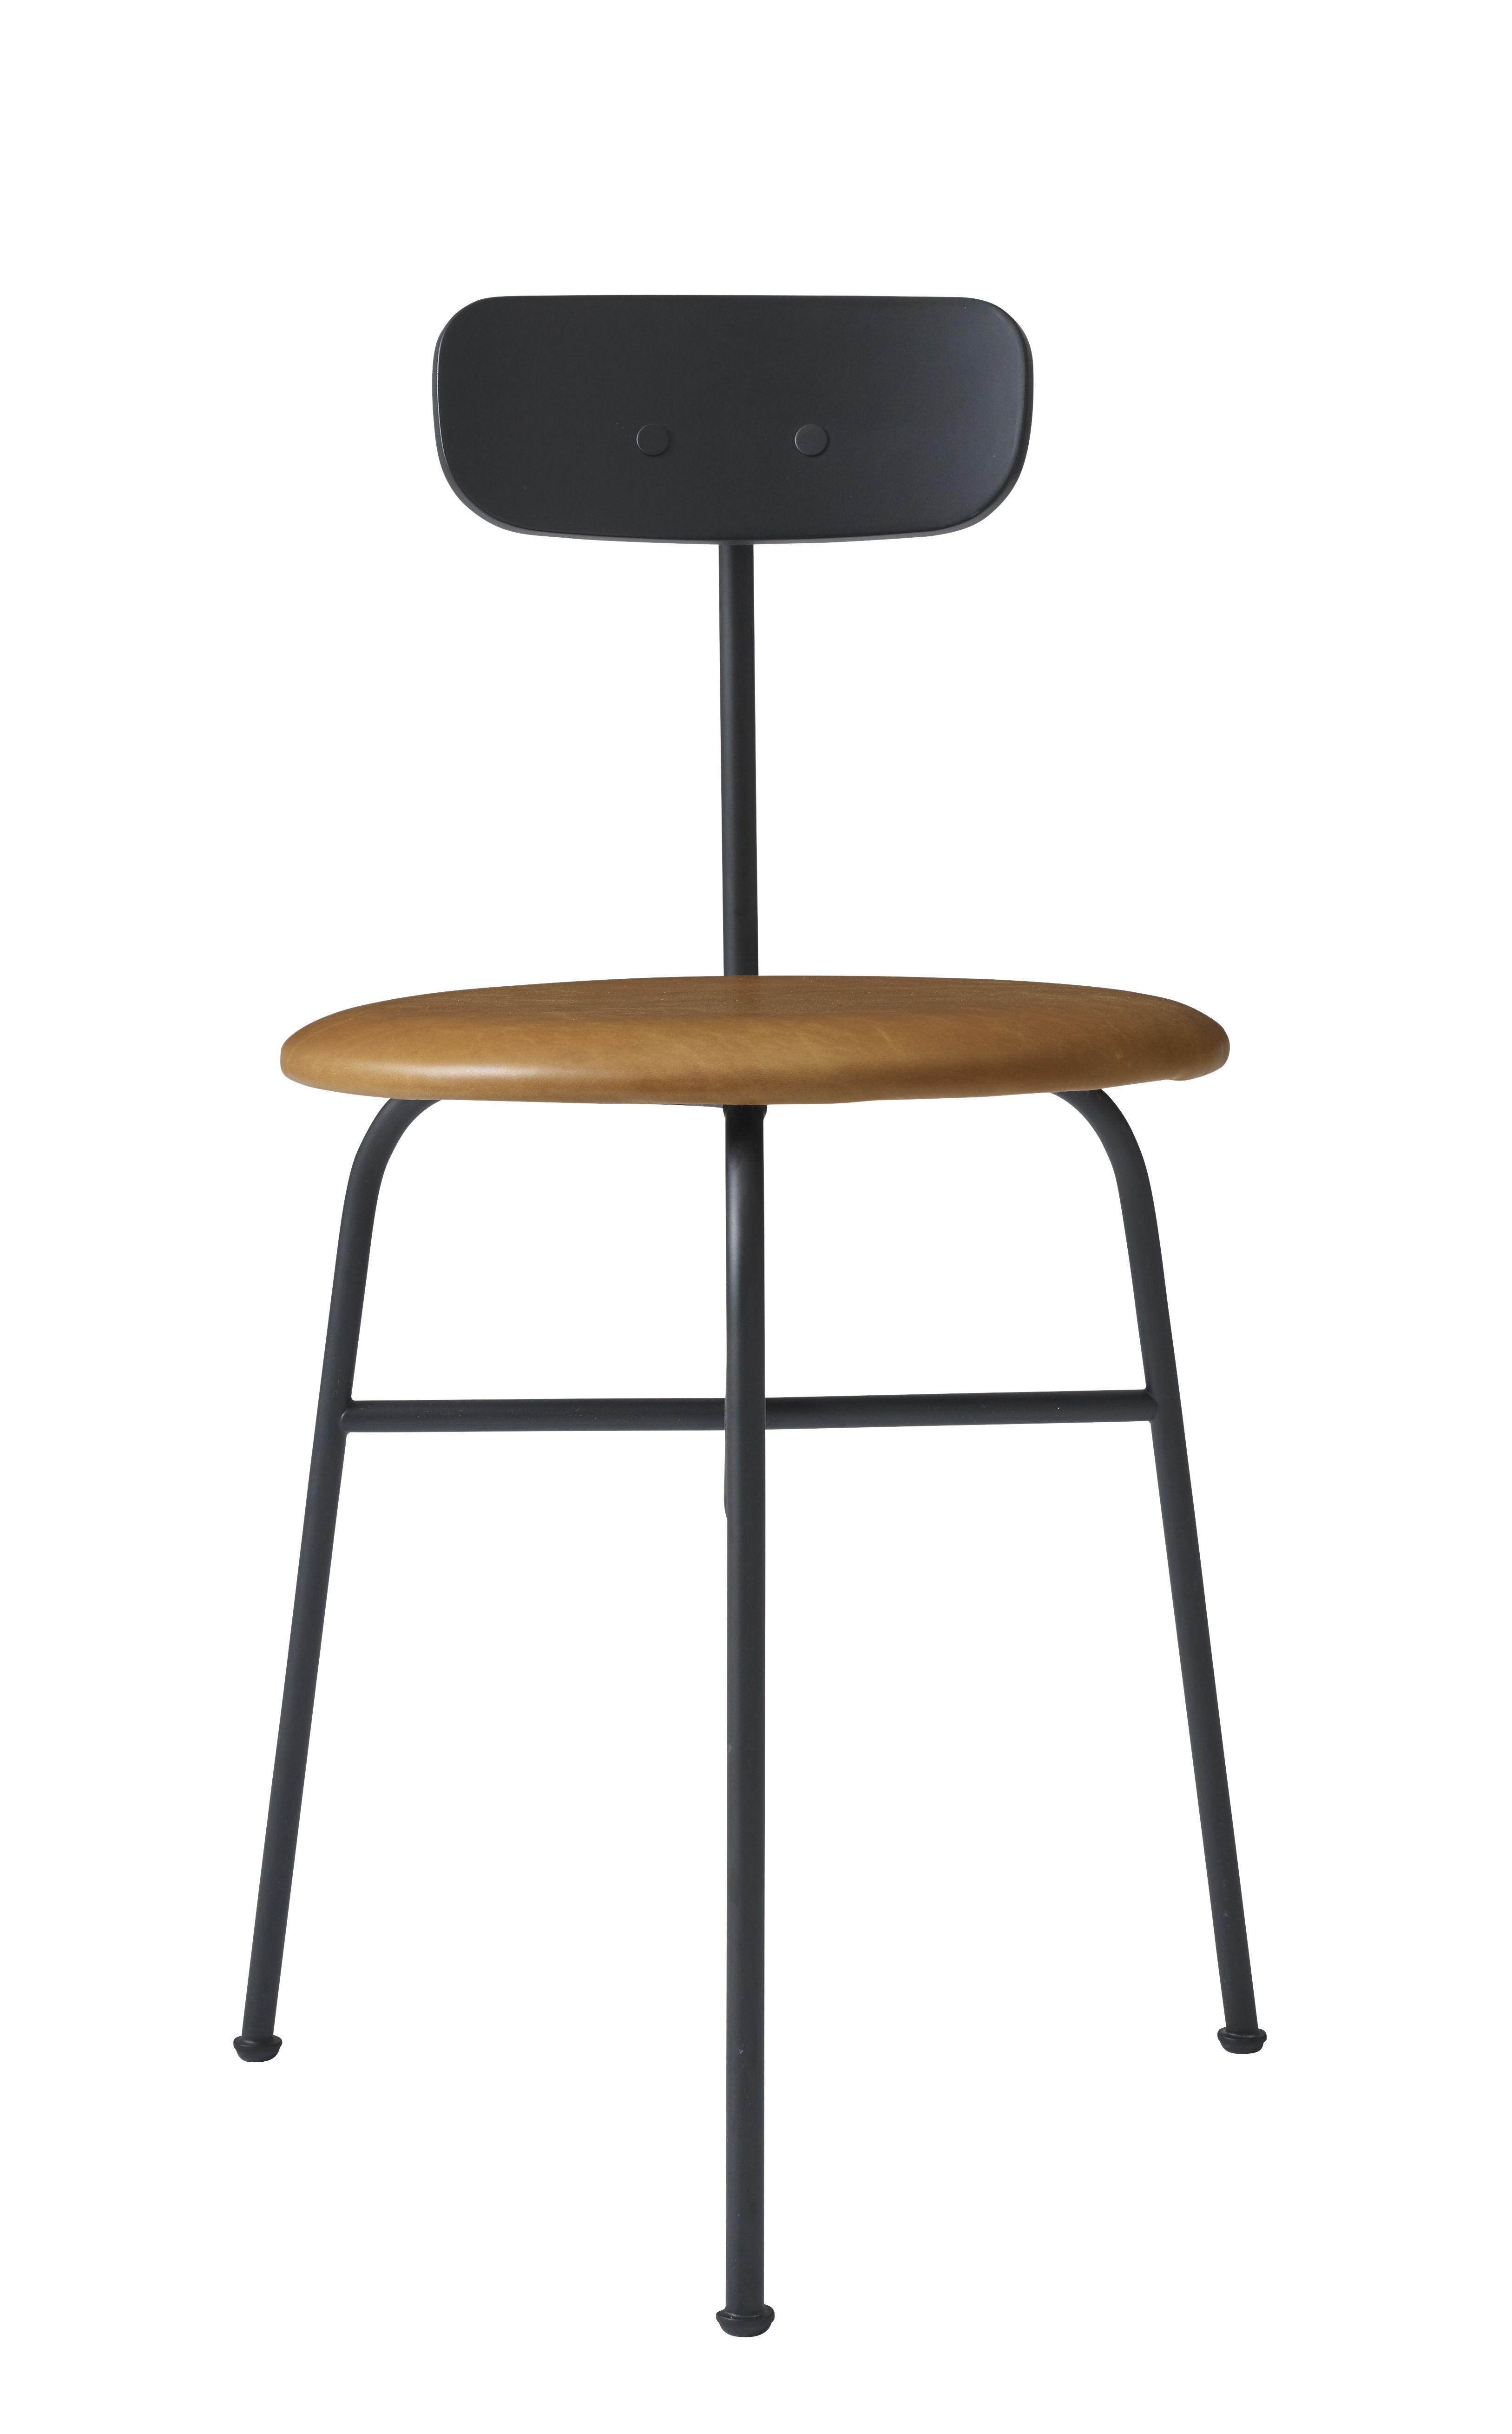 chaise rembourr e afteroom cuir bois assise cuir cognac noir menu made in design. Black Bedroom Furniture Sets. Home Design Ideas